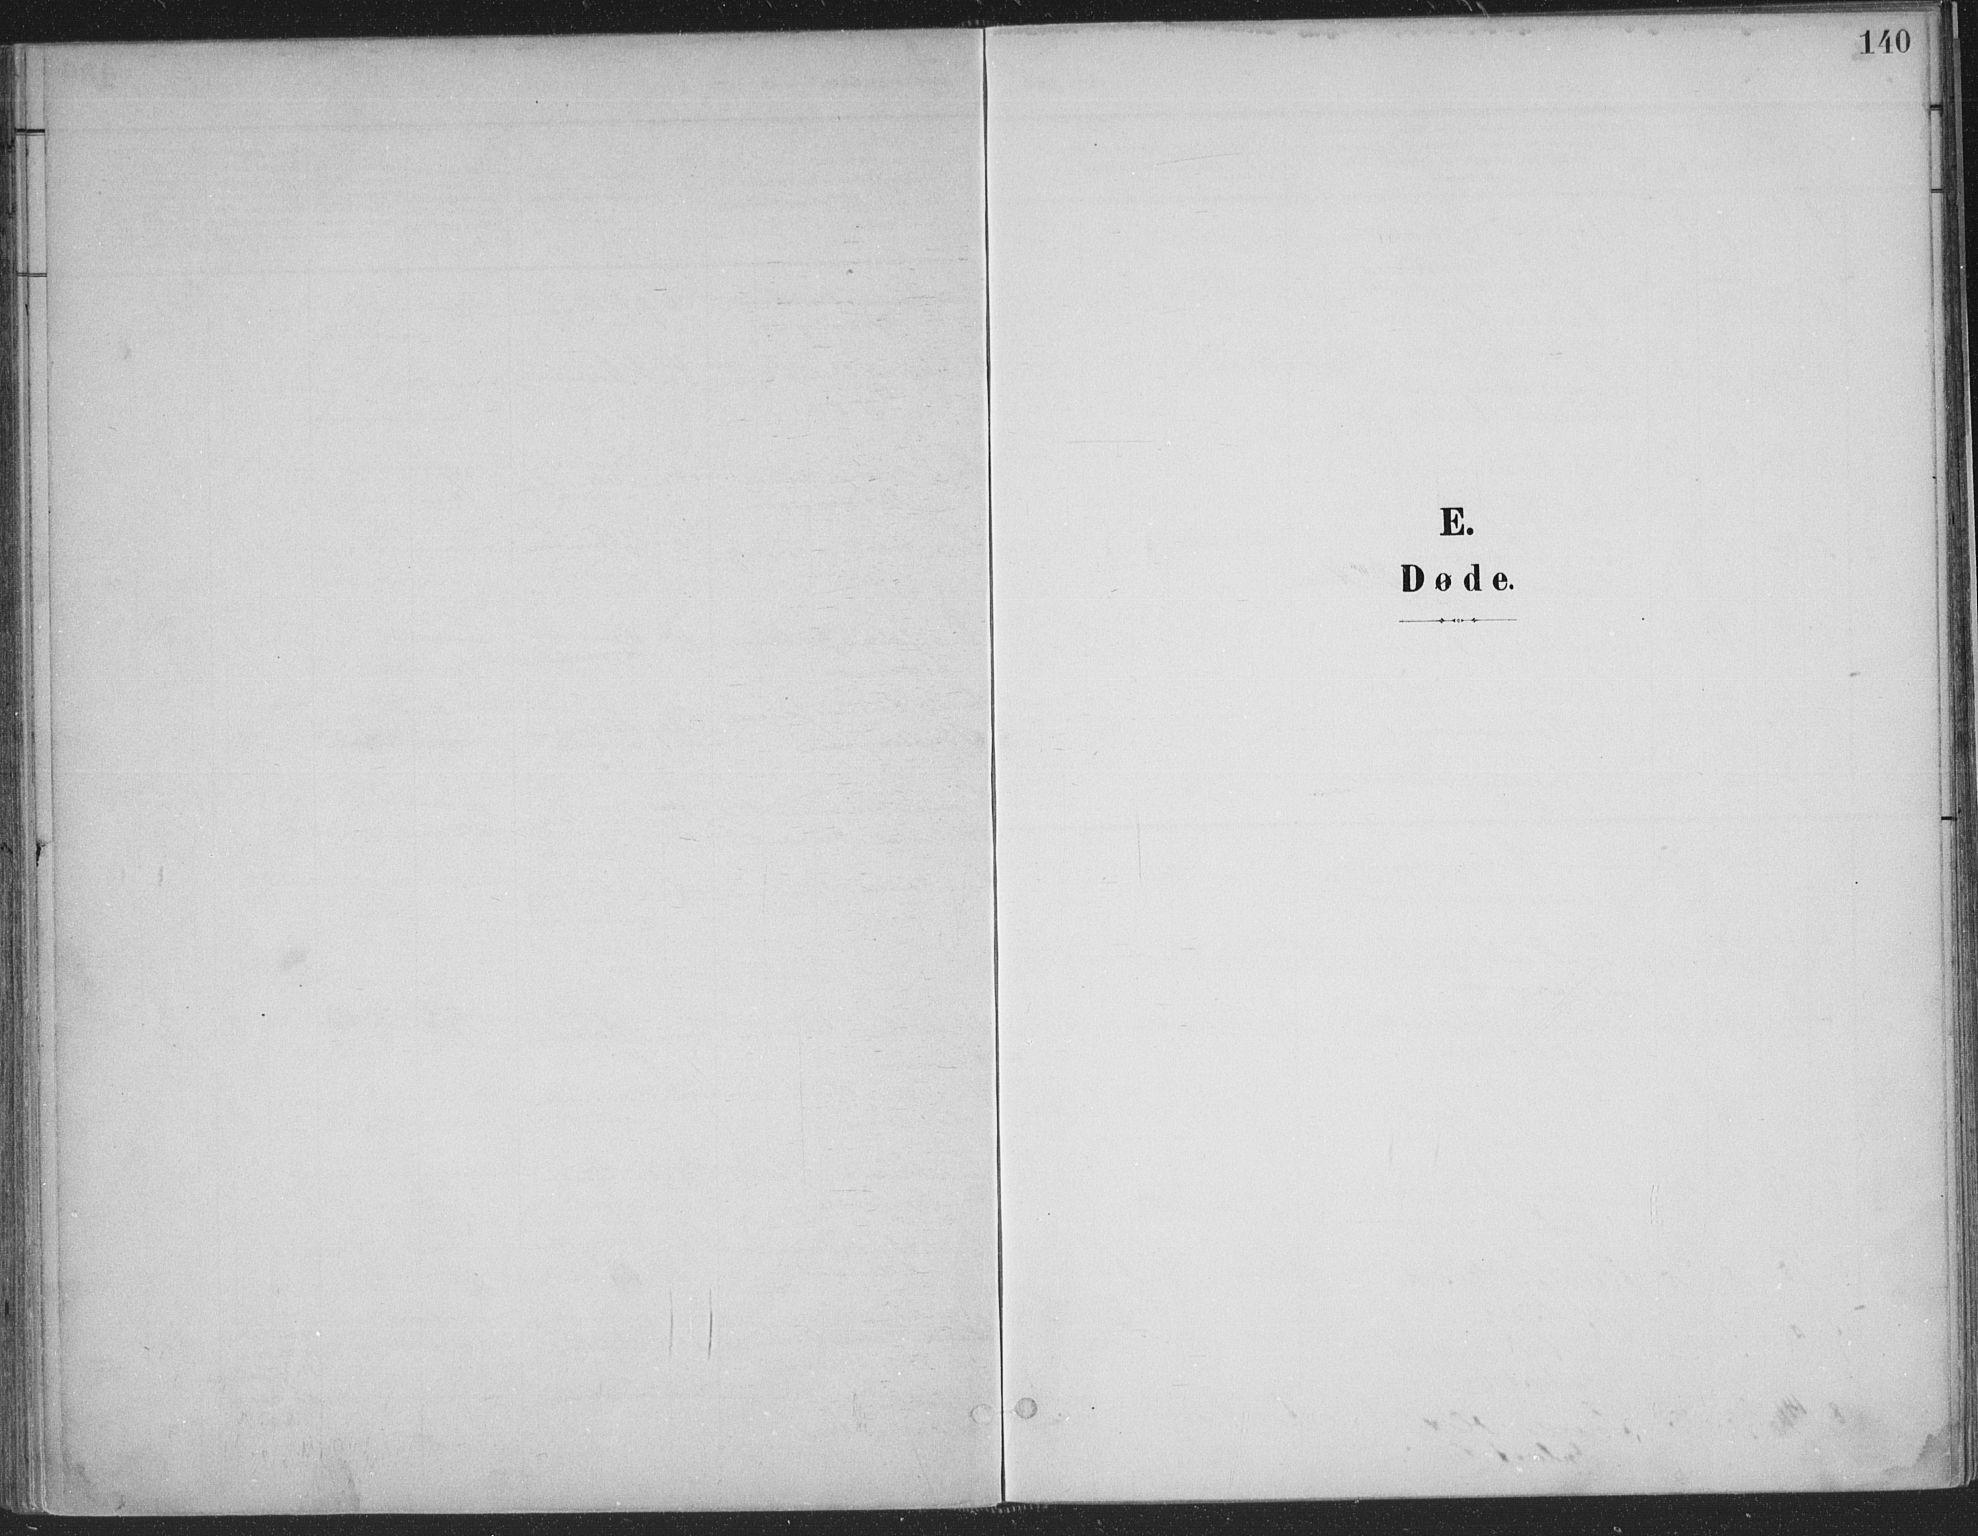 SAH, Østre Gausdal prestekontor, Ministerialbok nr. 4, 1898-1914, s. 140